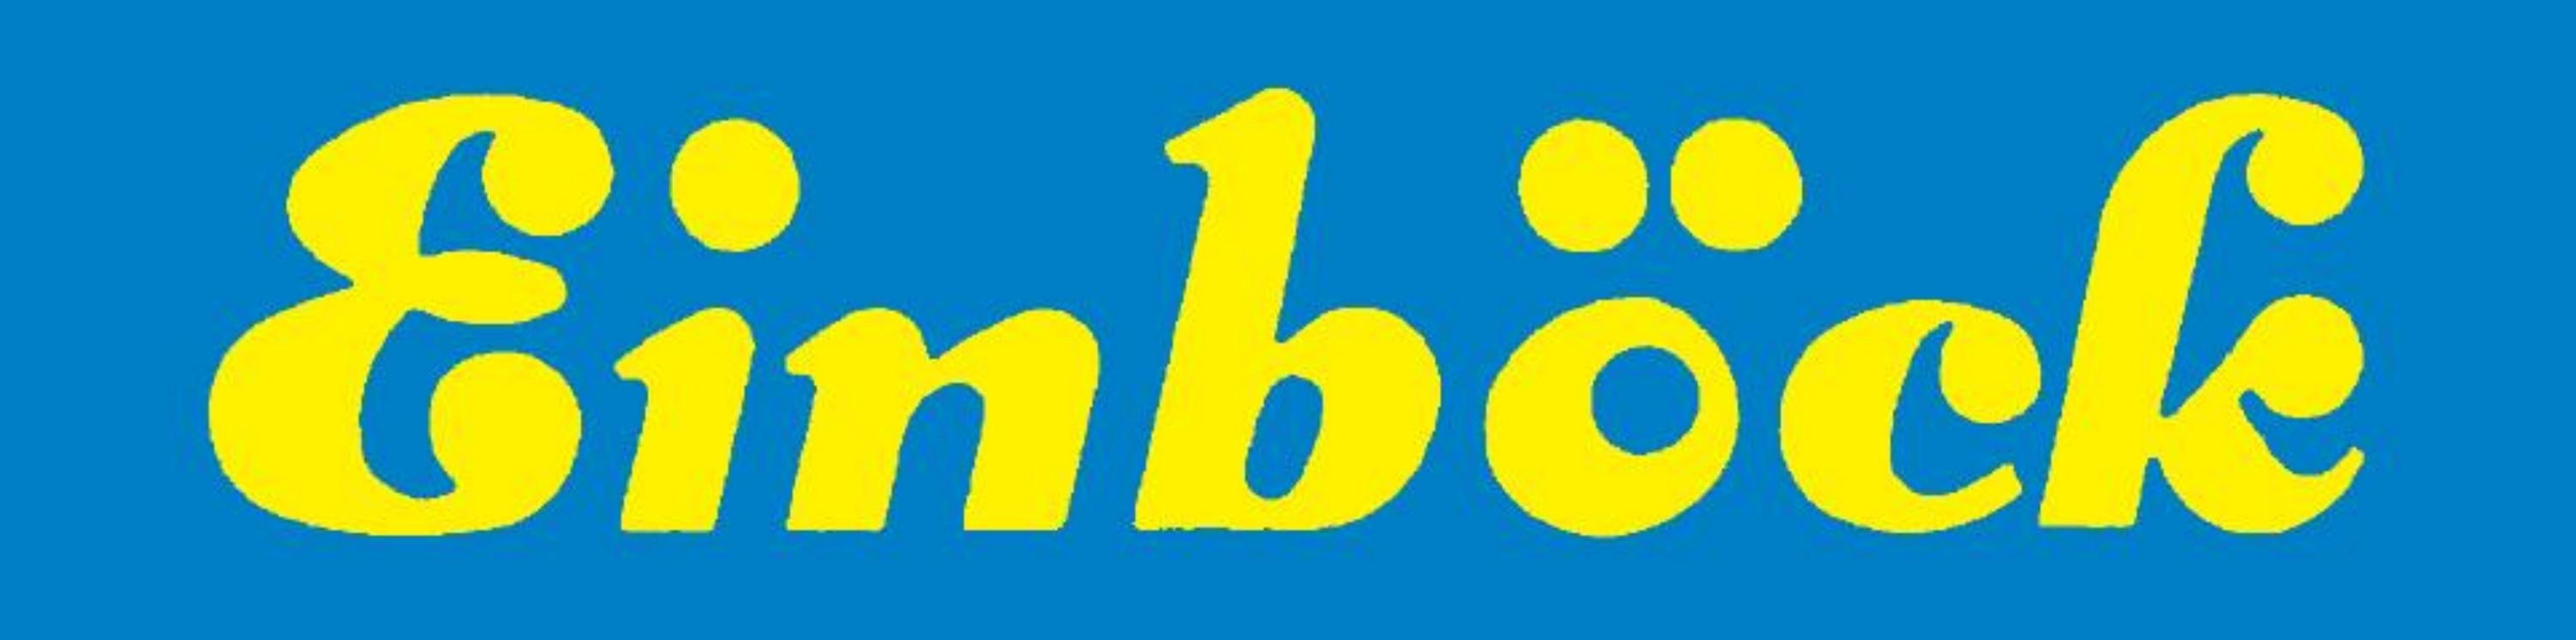 Einböck-LOGO-4C-KB032005-300-DPI